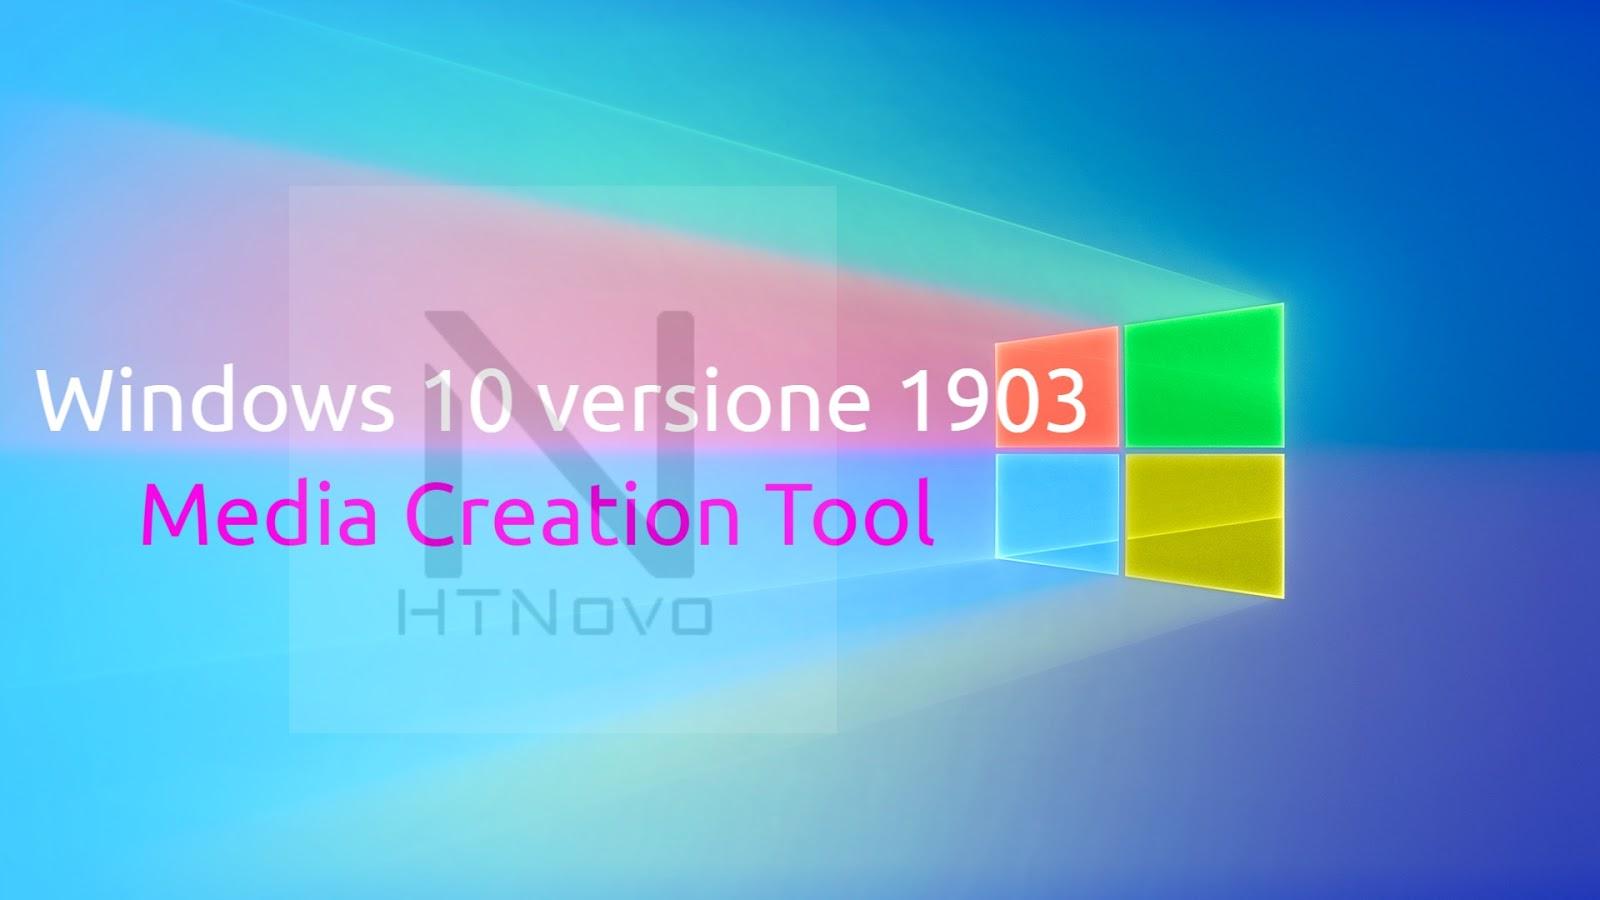 Windows-10-versione-1903-Media-Creation-Tool